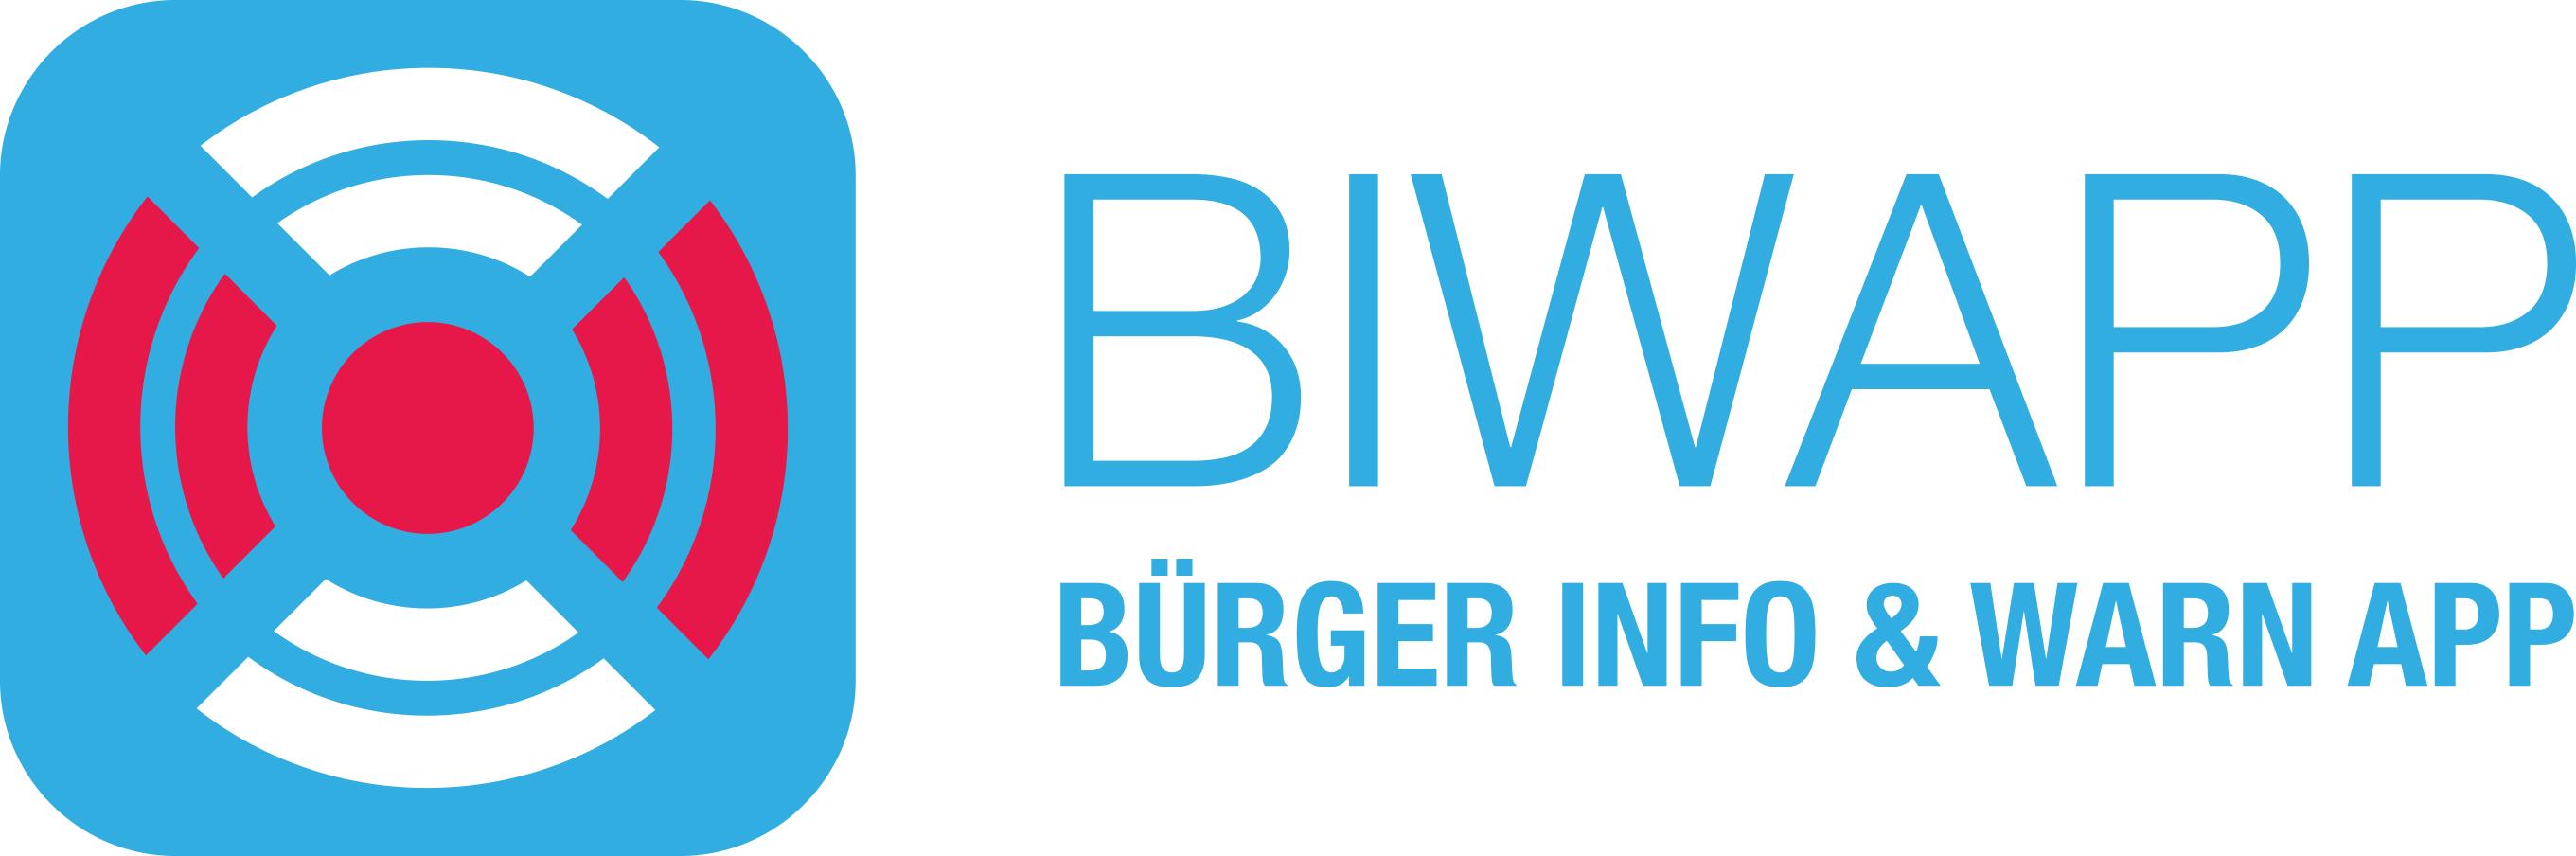 BIWAPP - Bürger Info & Warn App